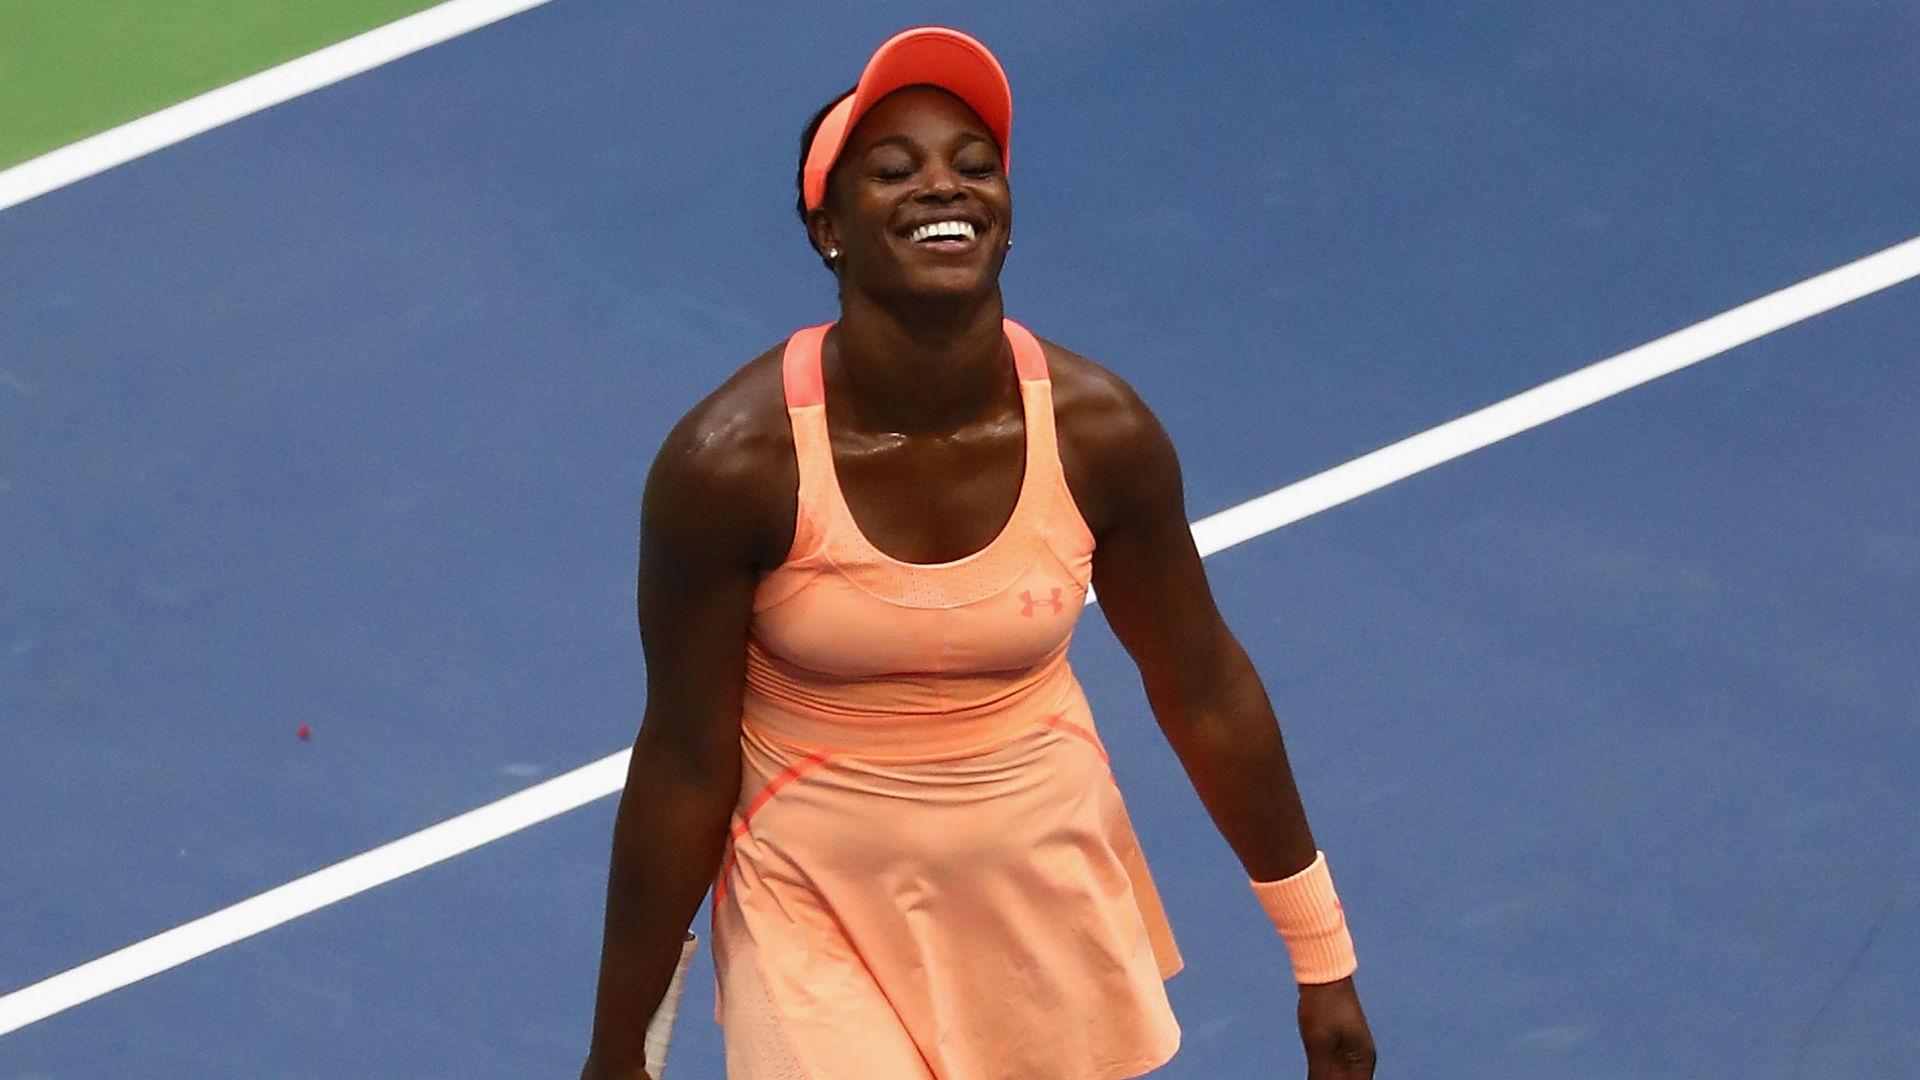 Sloane Stephens thrashes Madison Keys to claim incredible U.S. Open win